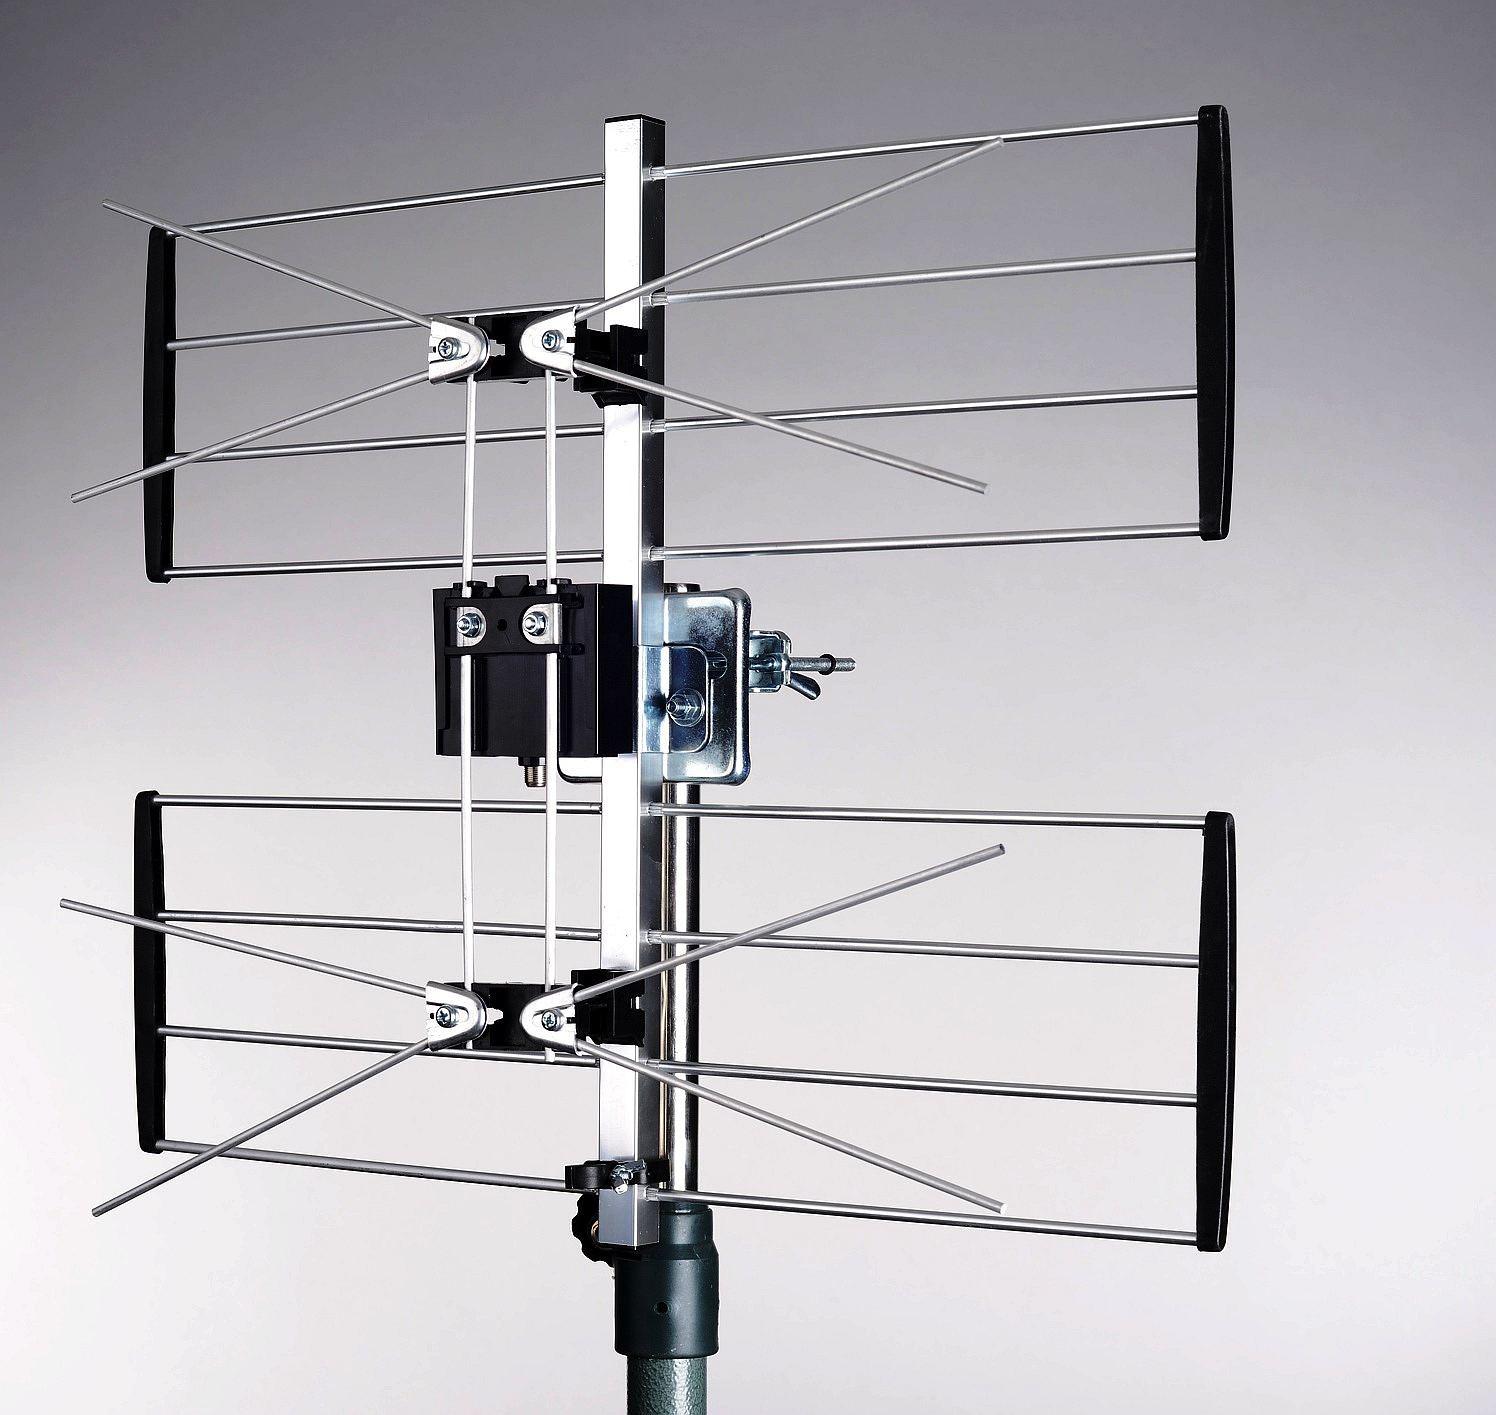 tv antenne uhf 2 gitterantenne 4g lte filter maximum. Black Bedroom Furniture Sets. Home Design Ideas